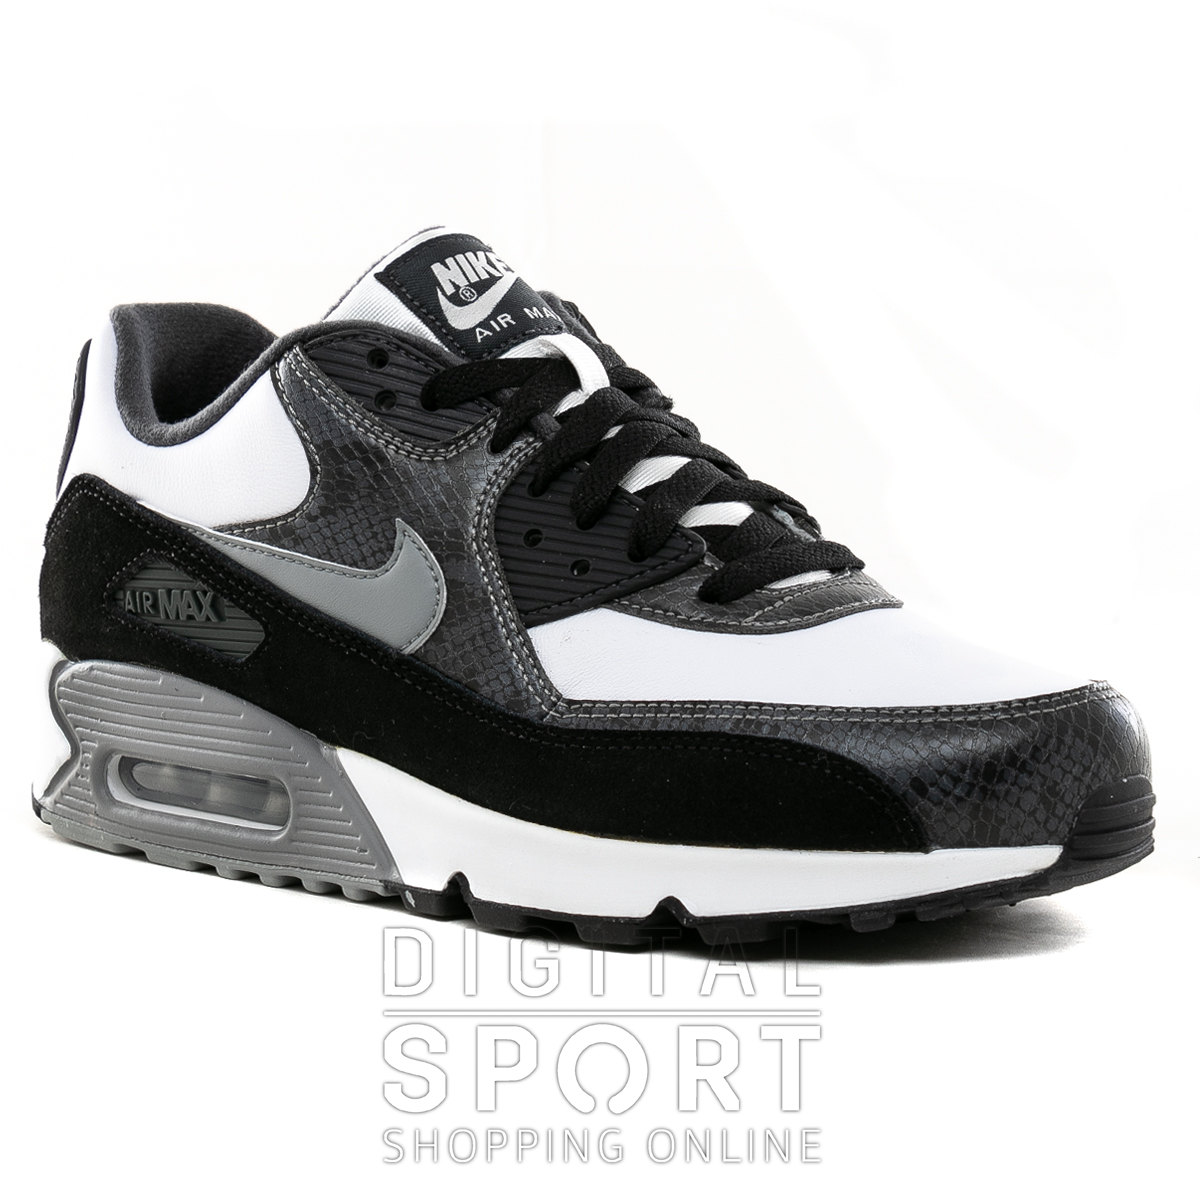 Zapatillas De Cuero Nike Pipa Rosa Talle 40 $ 2.000,00